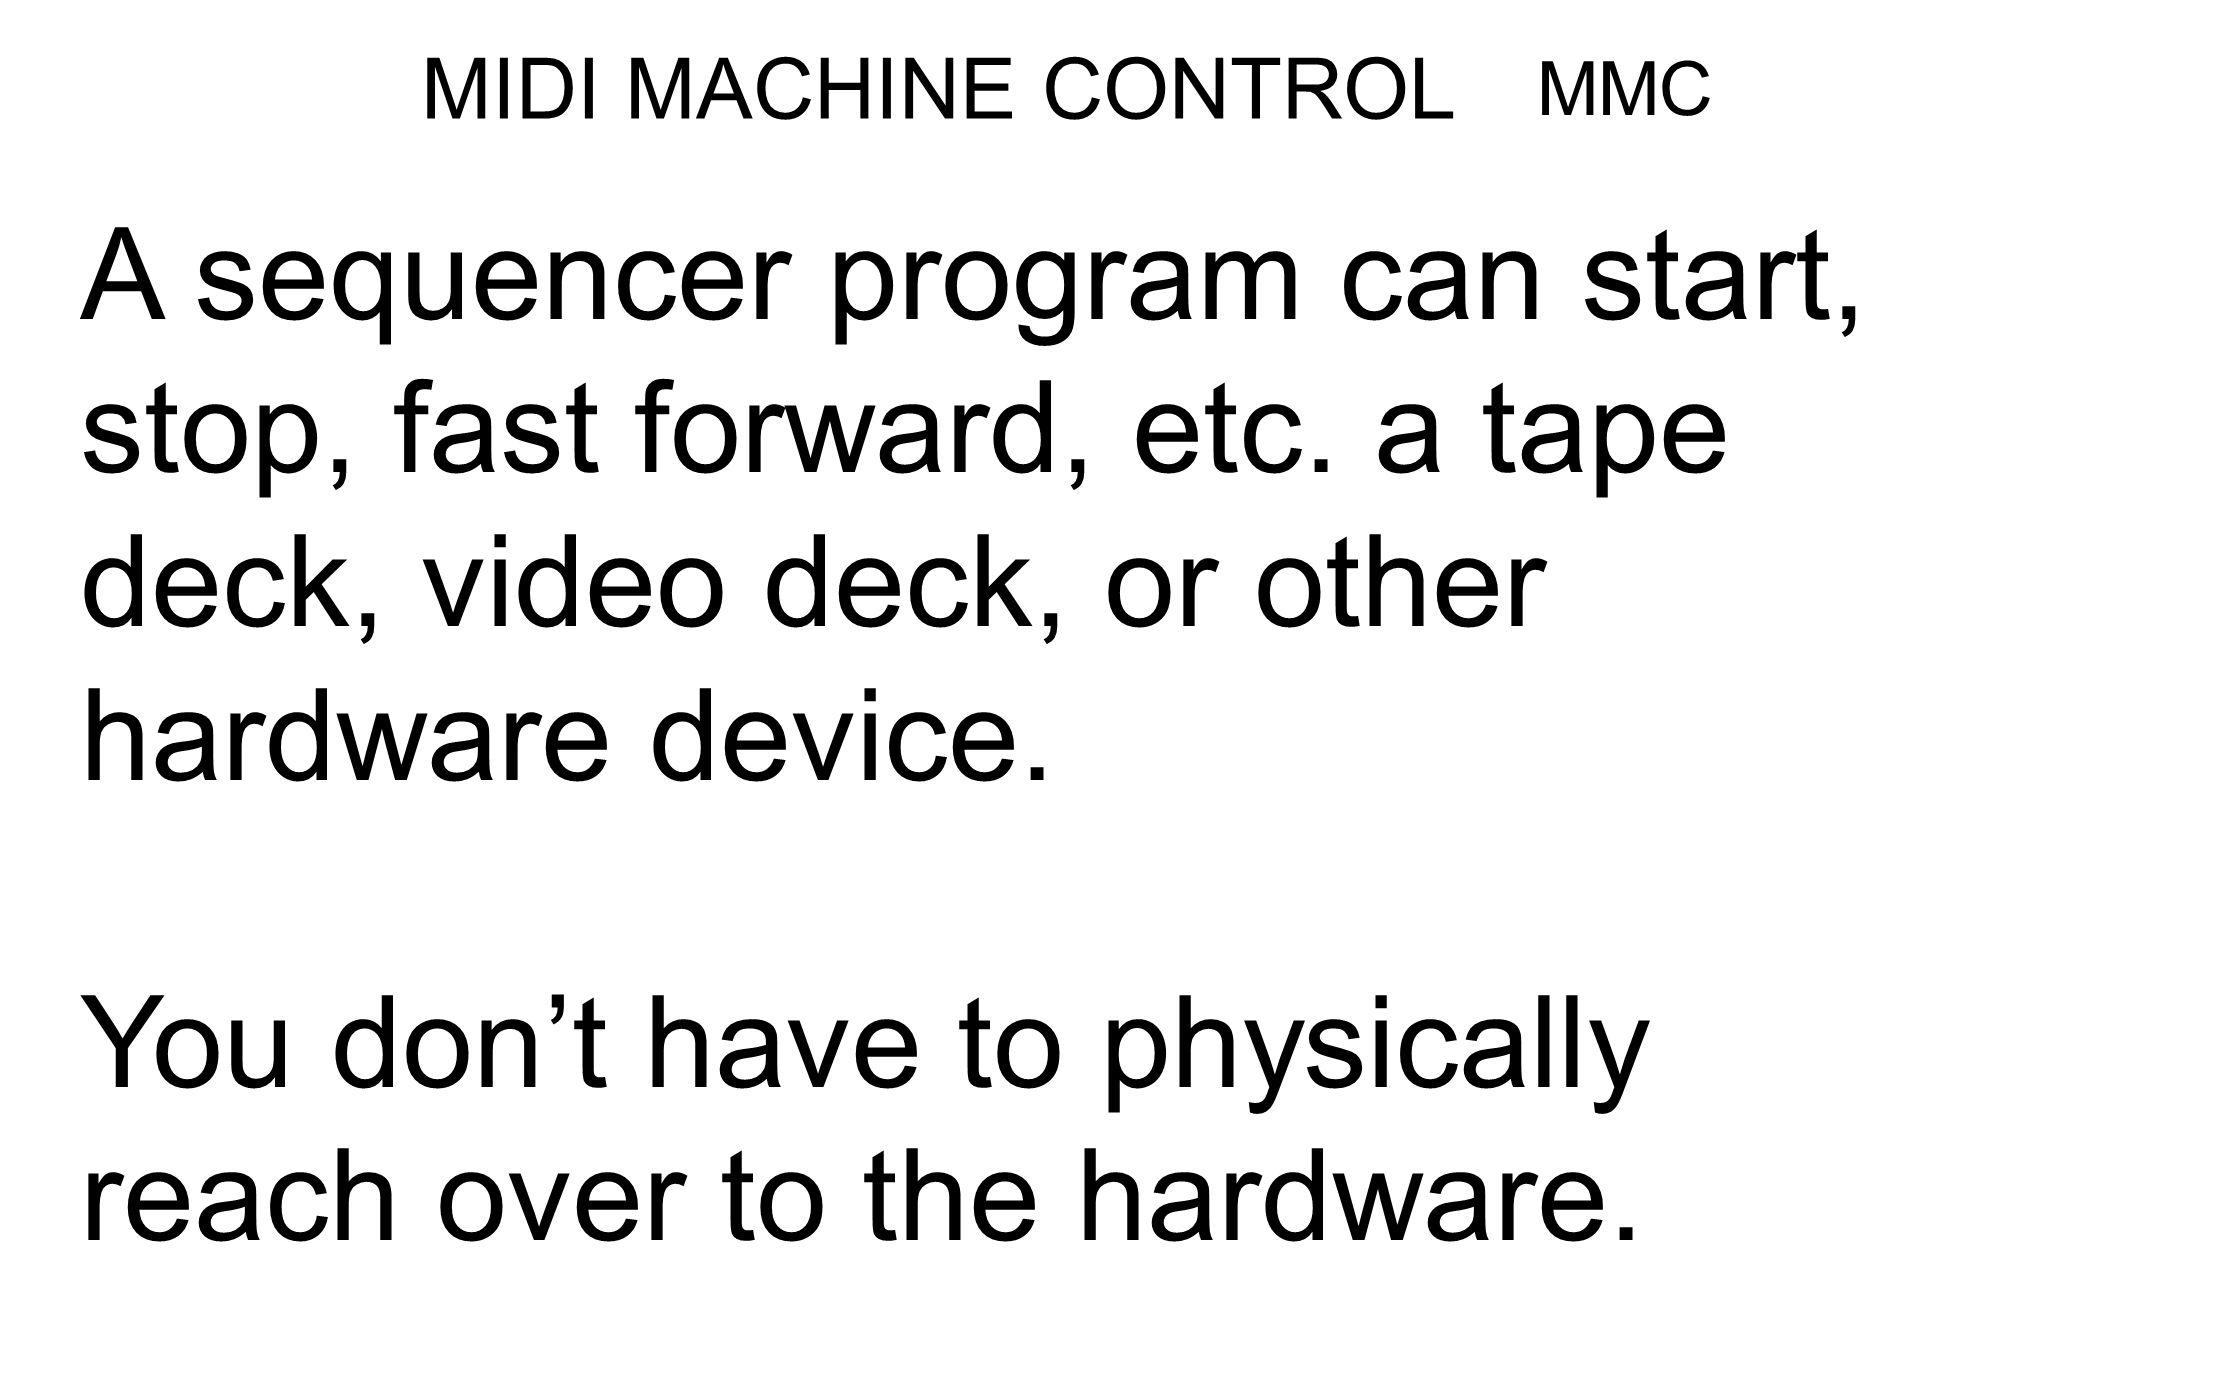 MIDI MACHINE CONTROL MMC https://www.youtube.com/watch?v=I-WoL7LzeRE